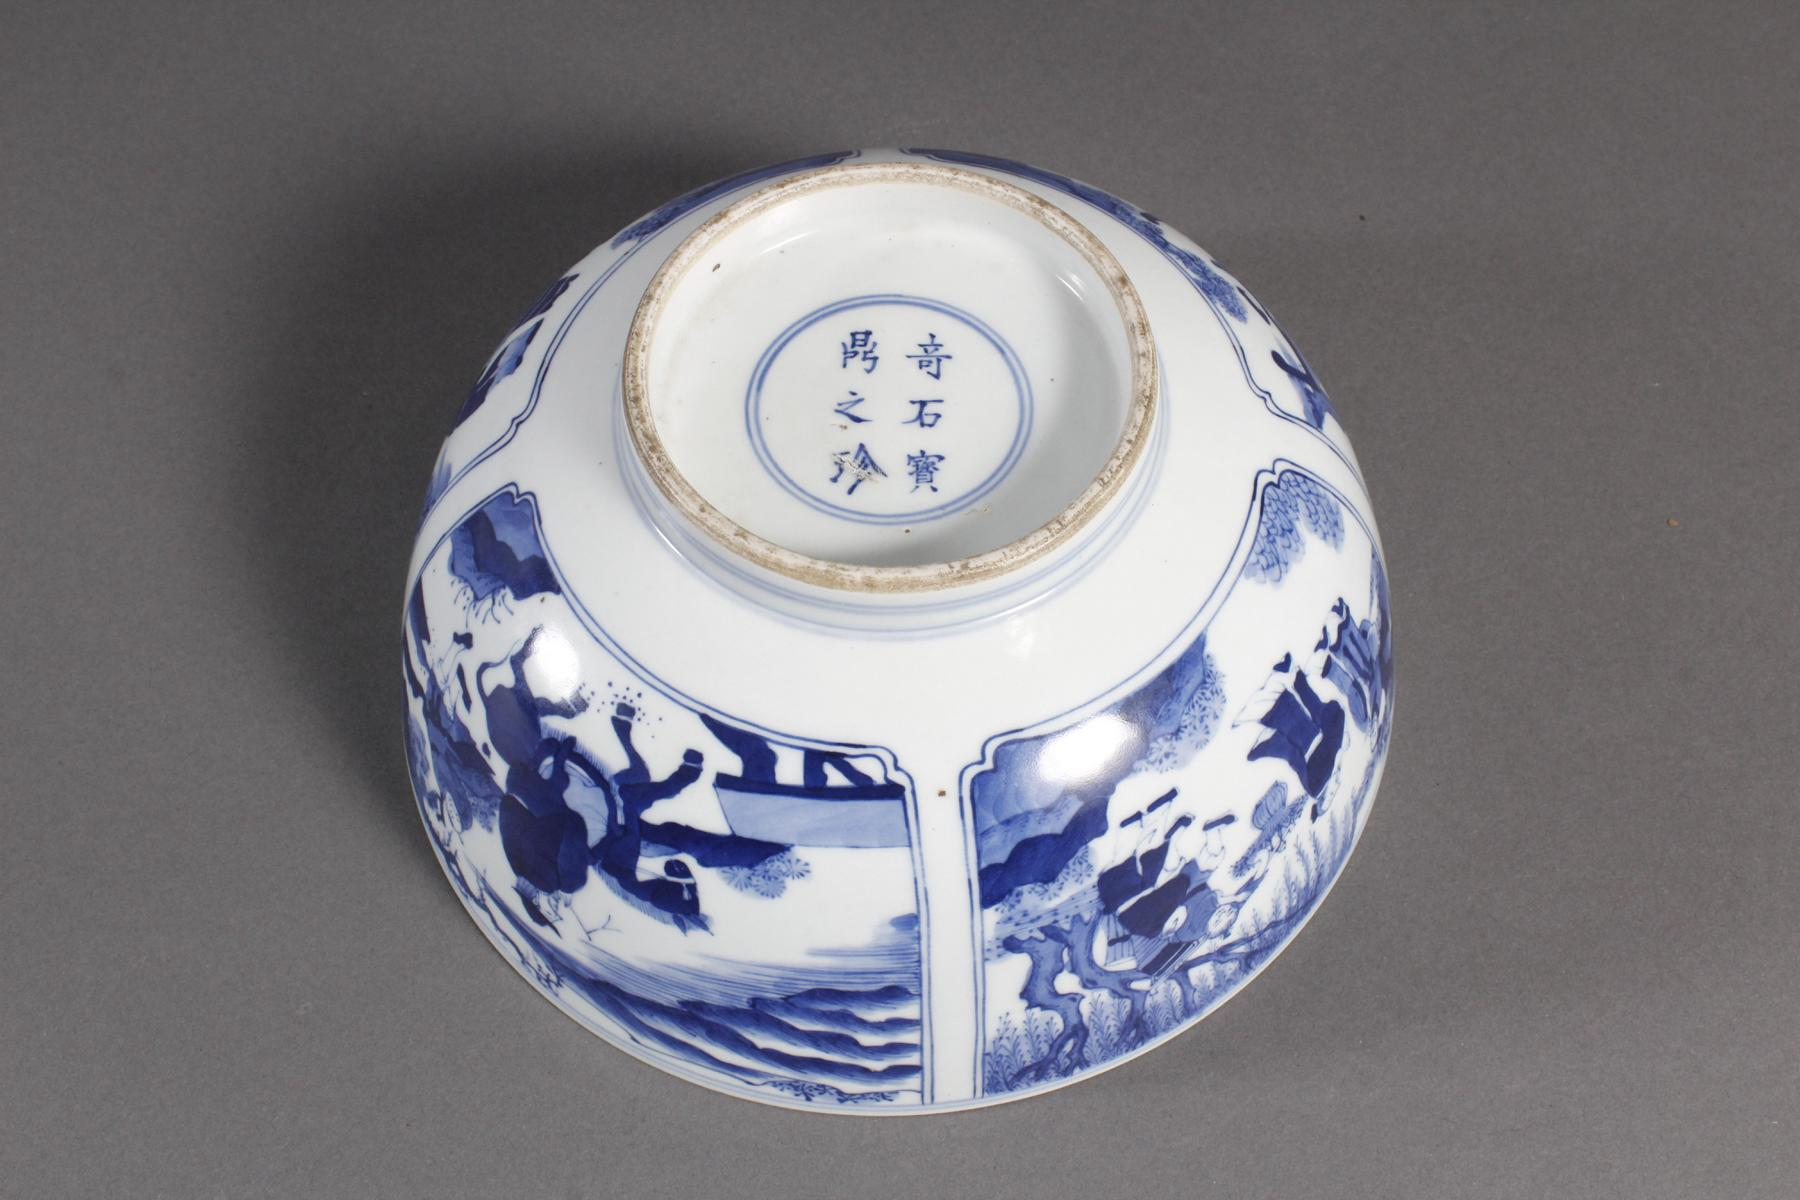 Porzellan-Kumme, China wohl 19. Jahrhundert-7